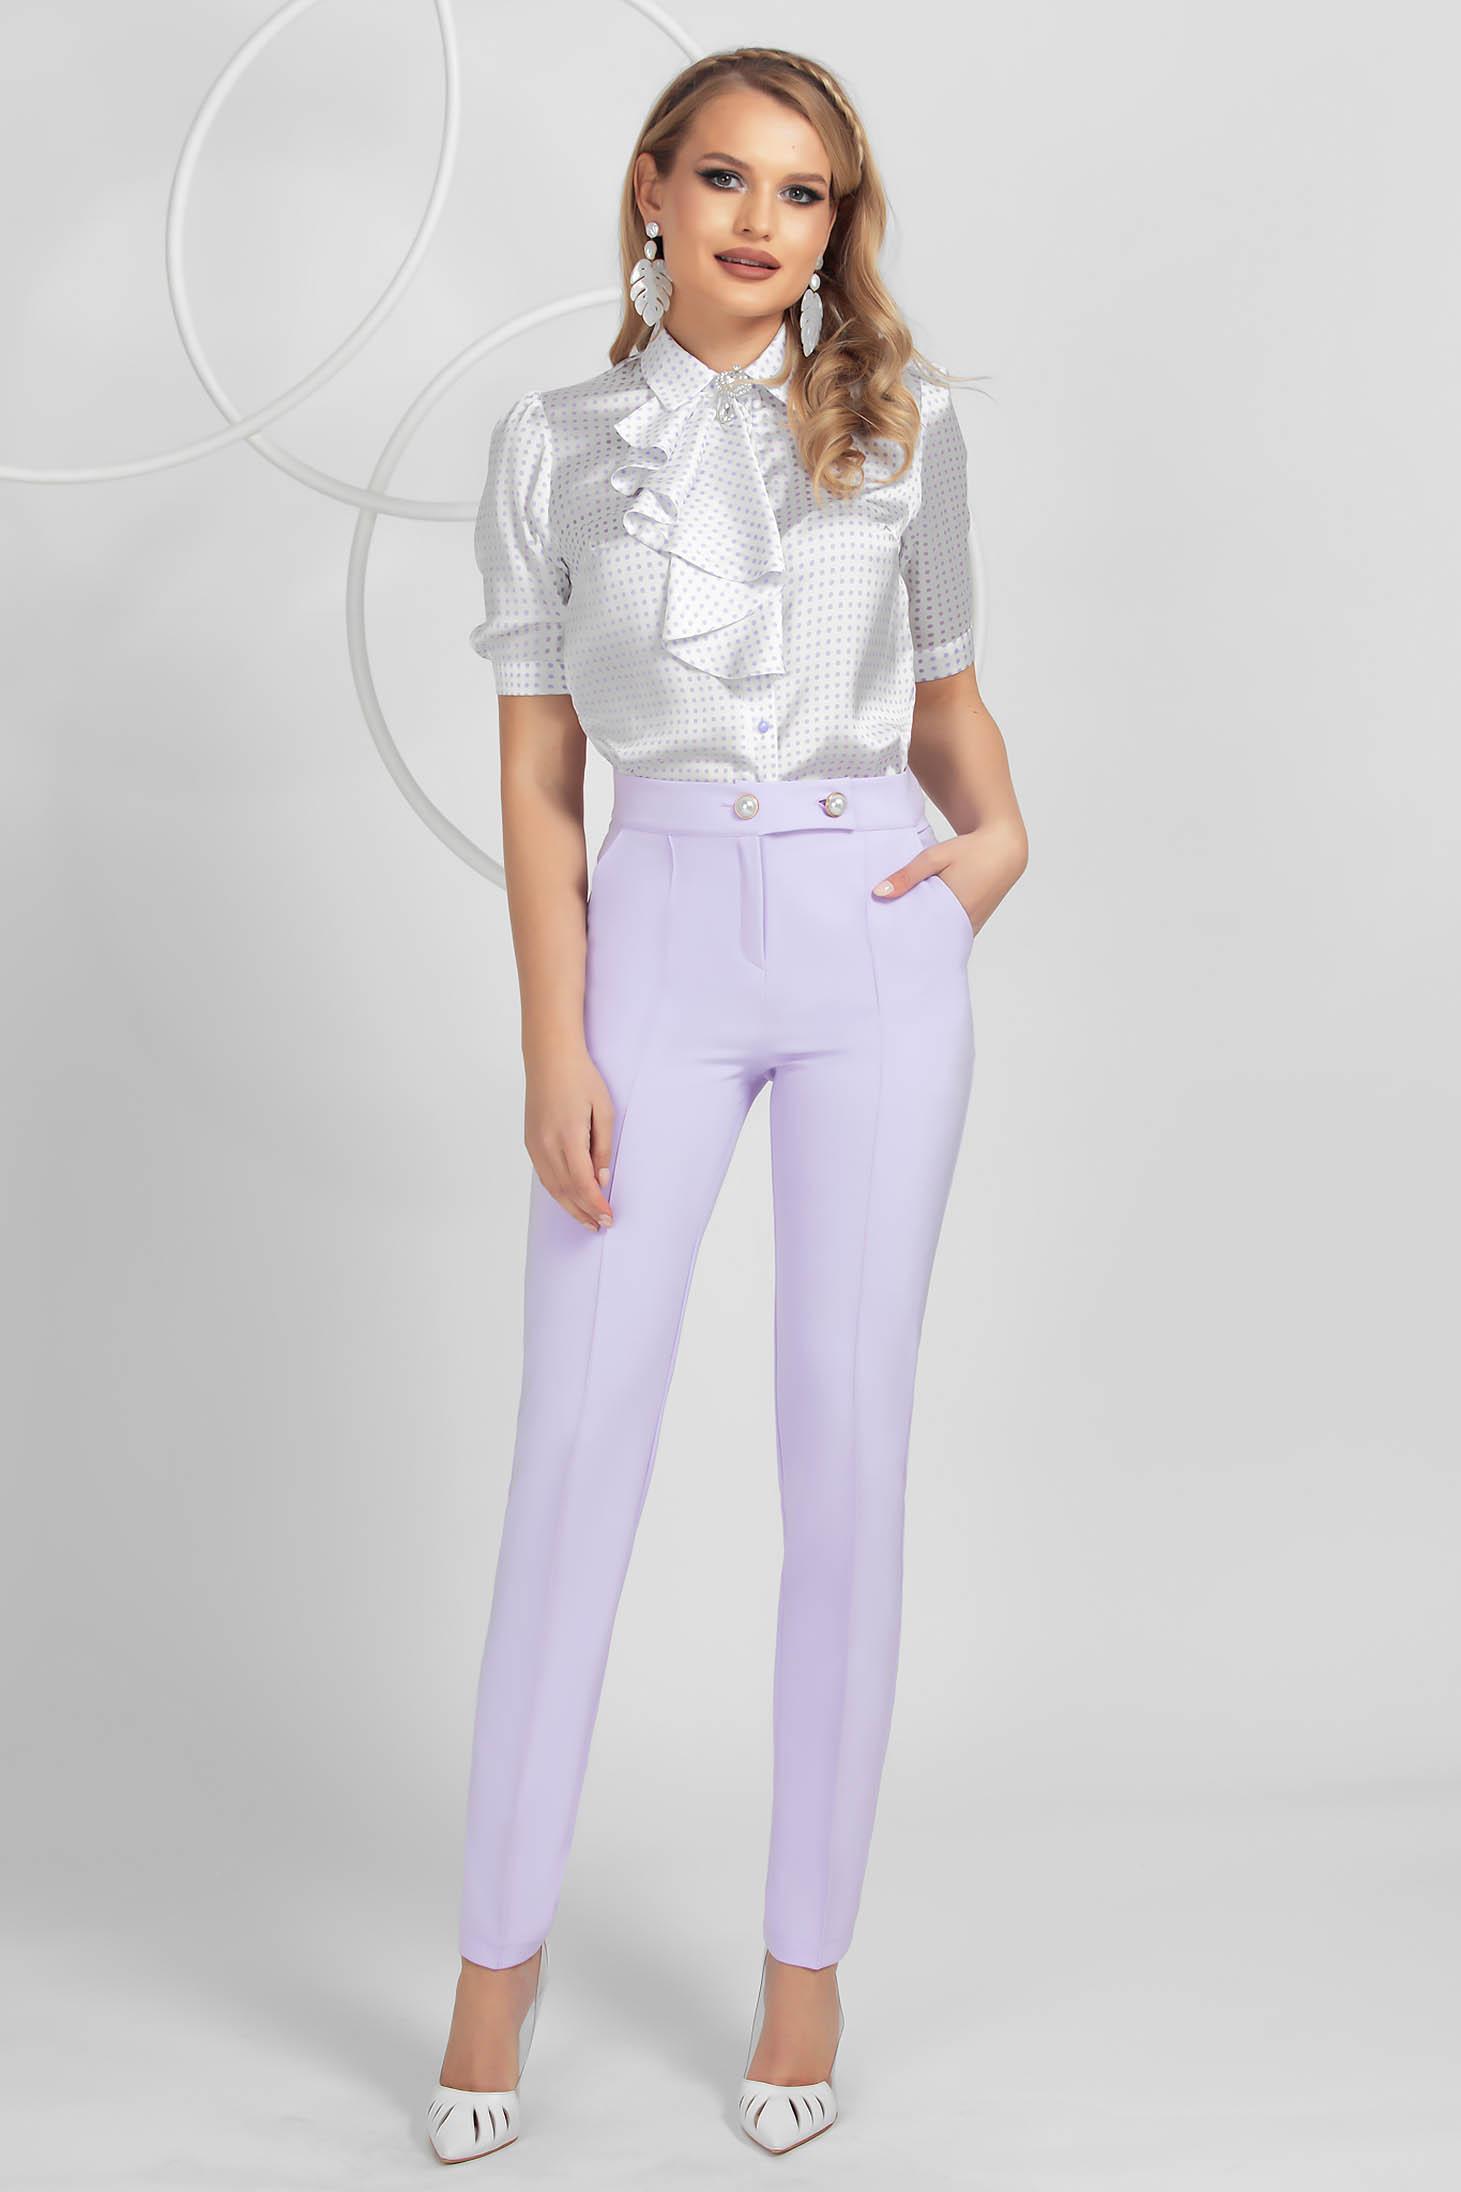 Lila kónikus nadrág enyhén rugalmas anyagból